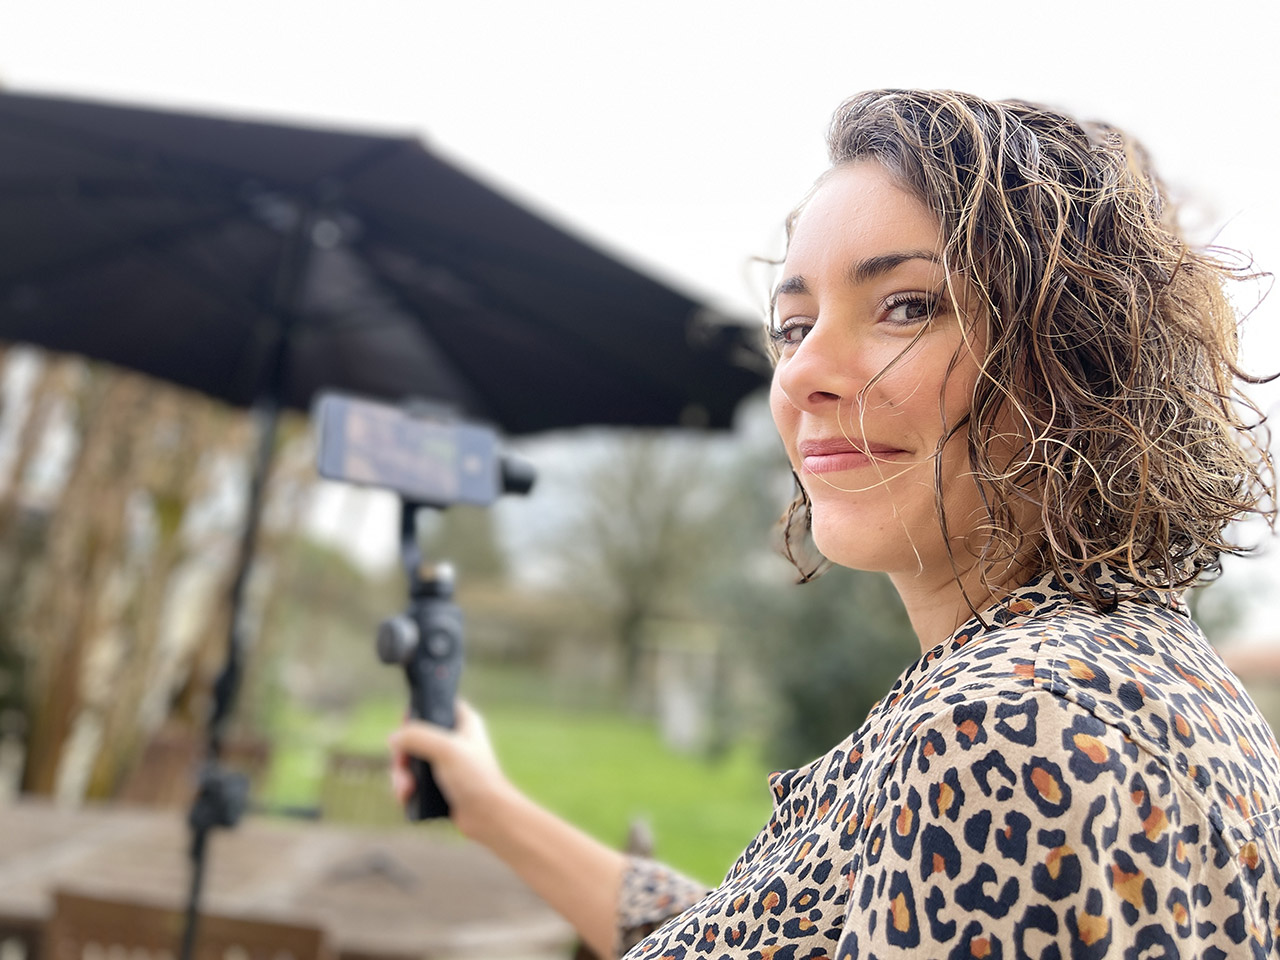 Agent Immobilier Vendee Audrey Bourseguin